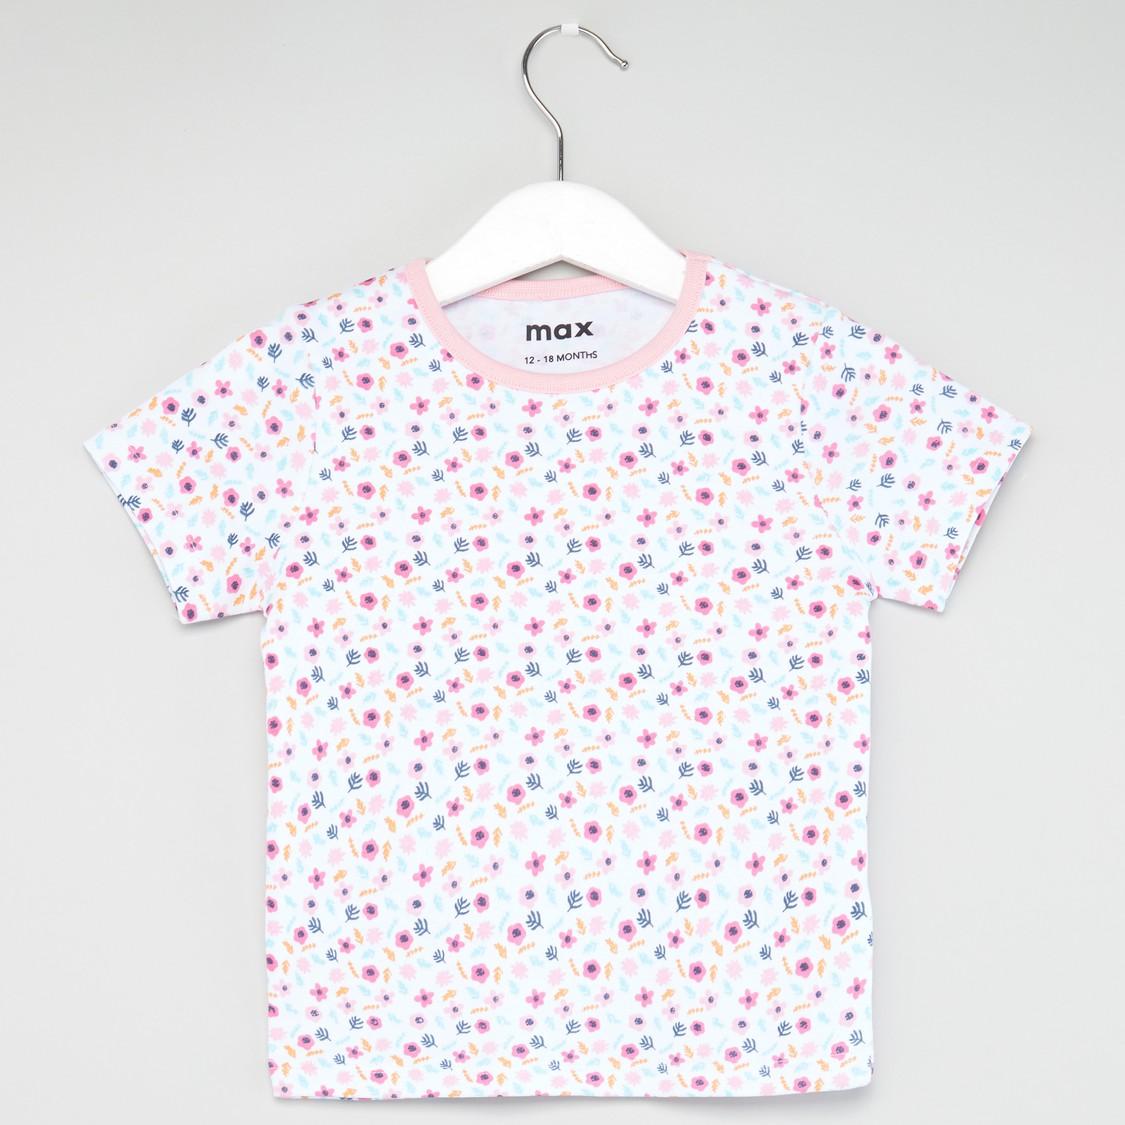 Ditsy Floral Print T-shirt and Pyjama Set